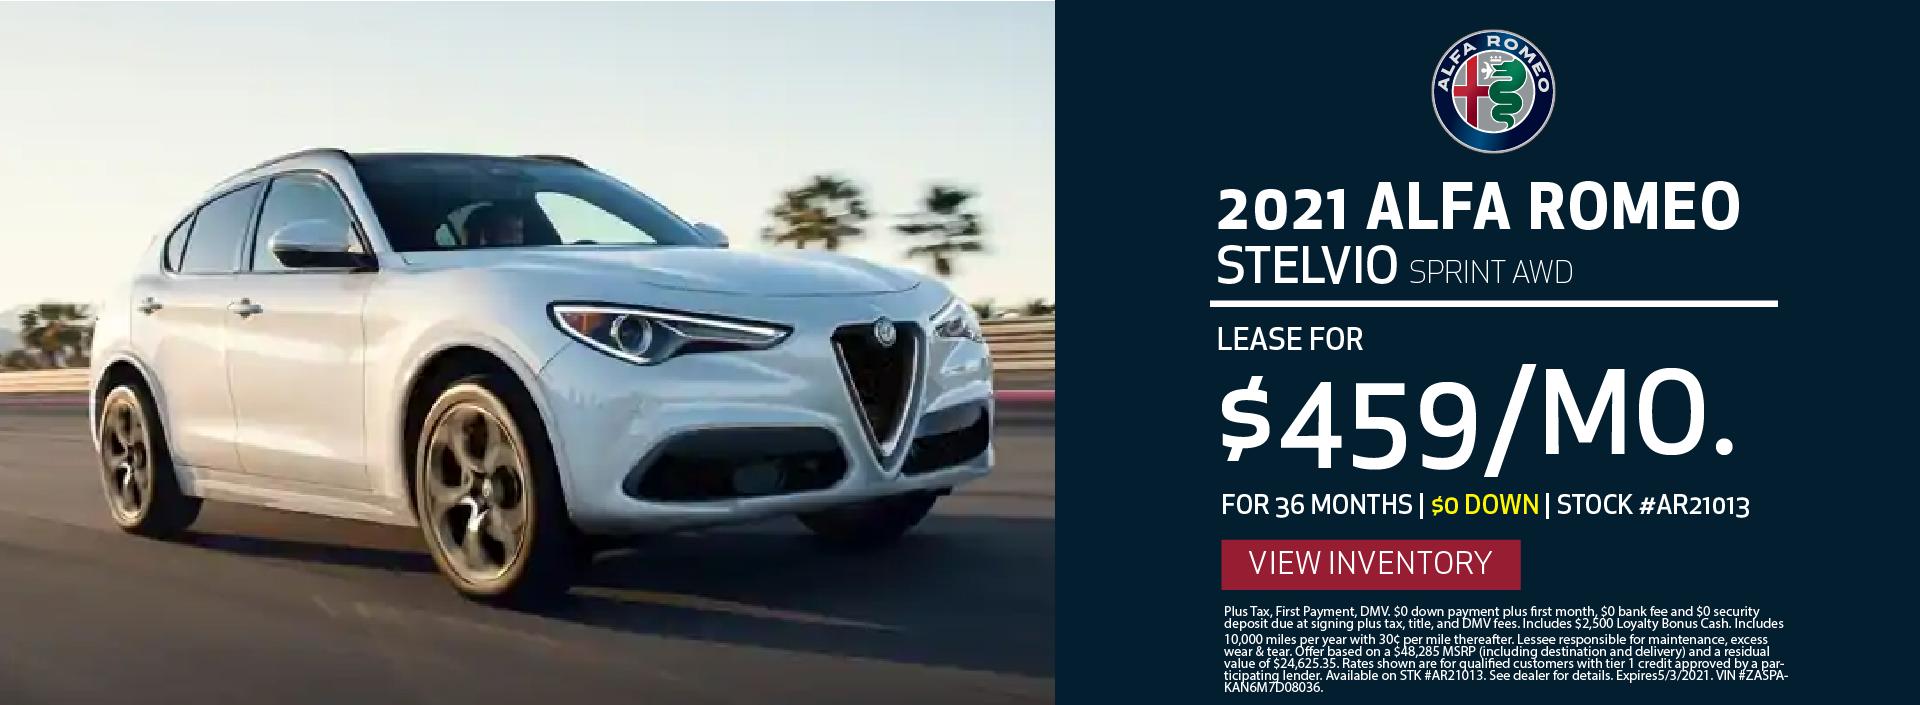 Manhattan Alfa Romeo – 2021 Stelvio Sprint